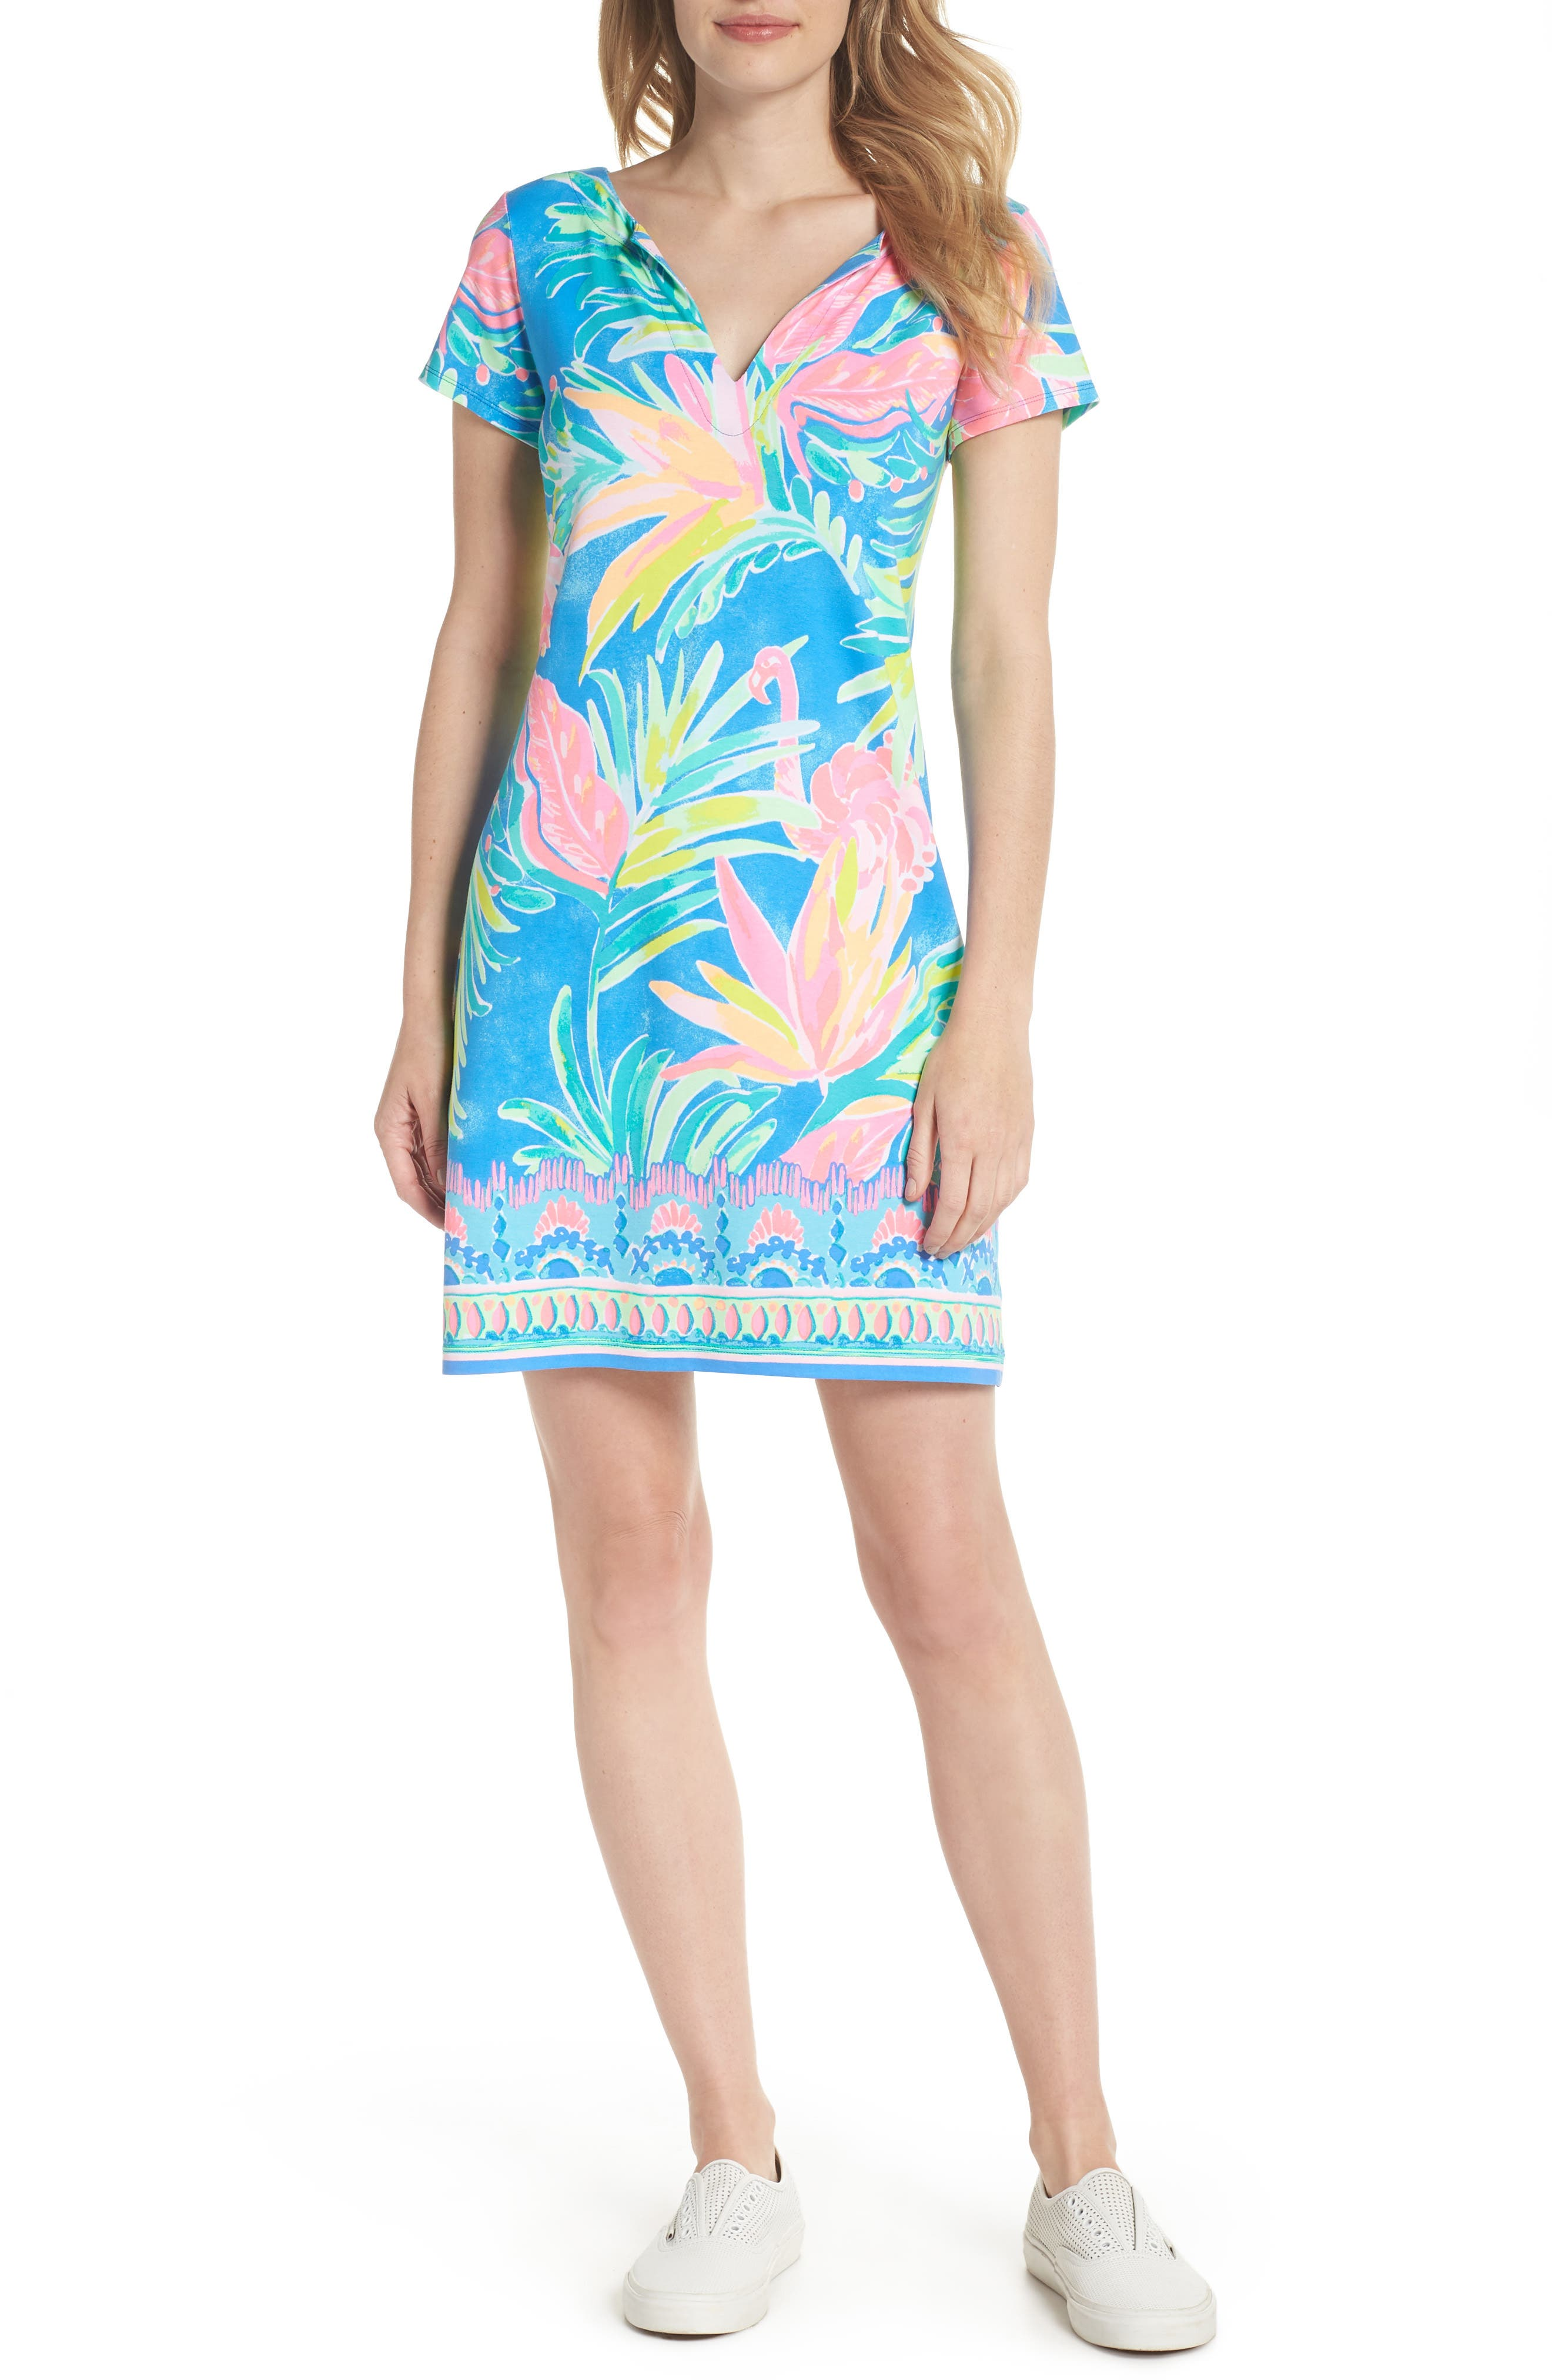 Sophiletta UPF 50+ Dress,                             Alternate thumbnail 5, color,                             420